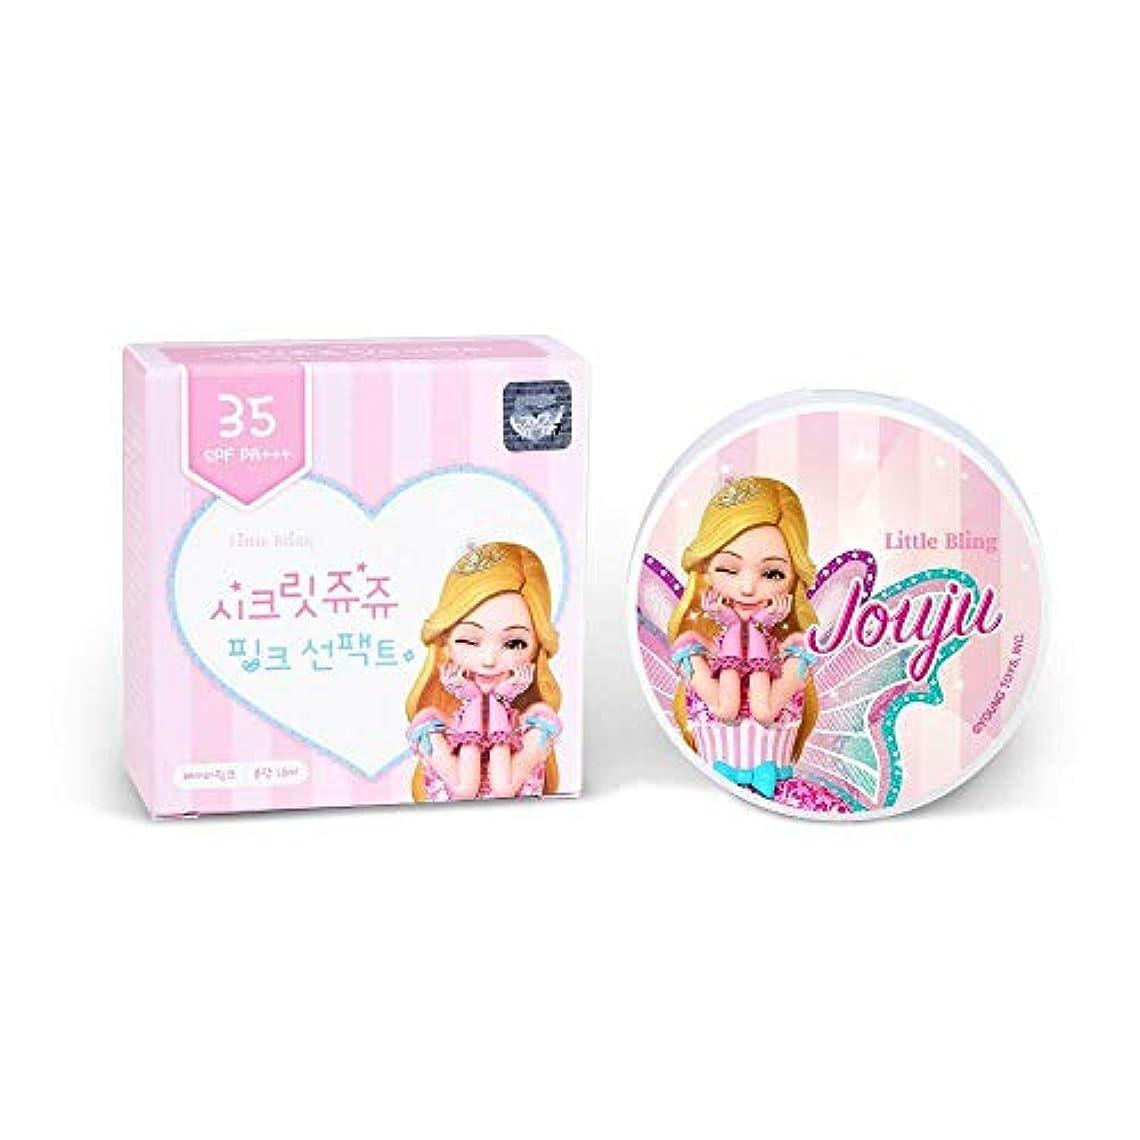 Little Bling Secret Jouju Pink Sun Pact ピンク サンパクト SPF35 PA+++ 韓国日焼け止め